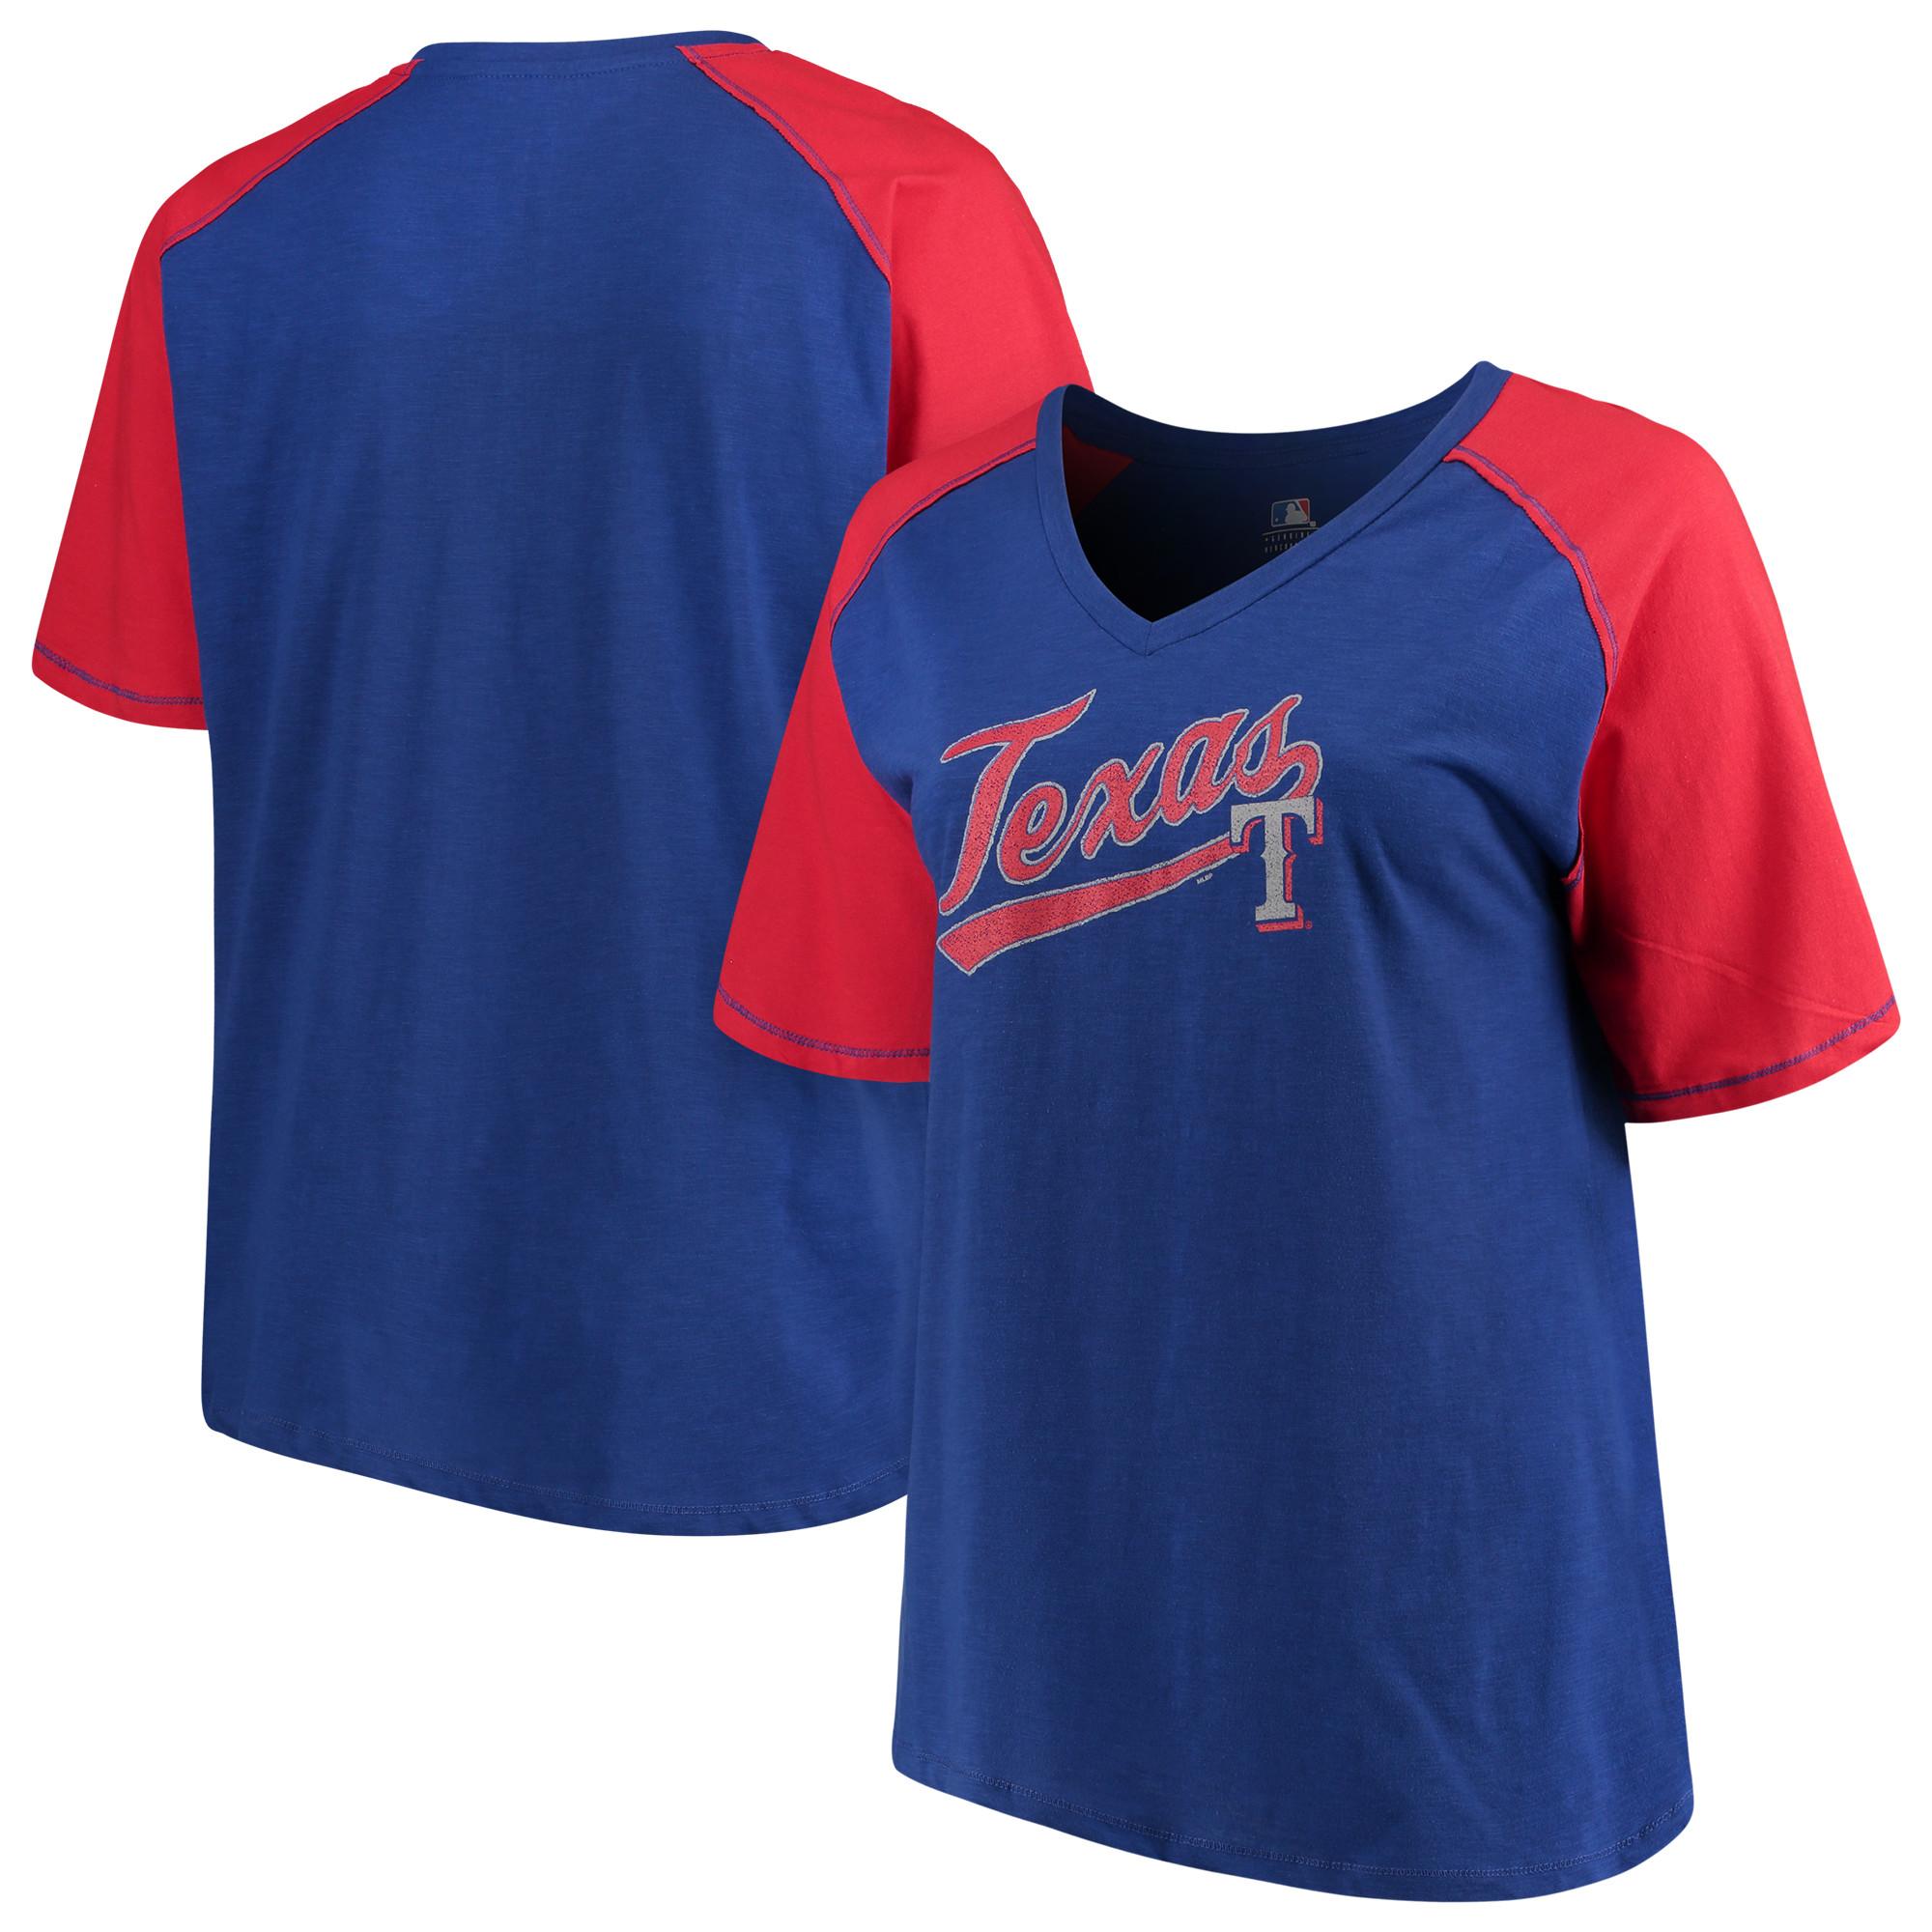 Women's Majestic Royal/Red Texas Rangers Plus Size High Percentage Raglan V-Neck T-Shirt